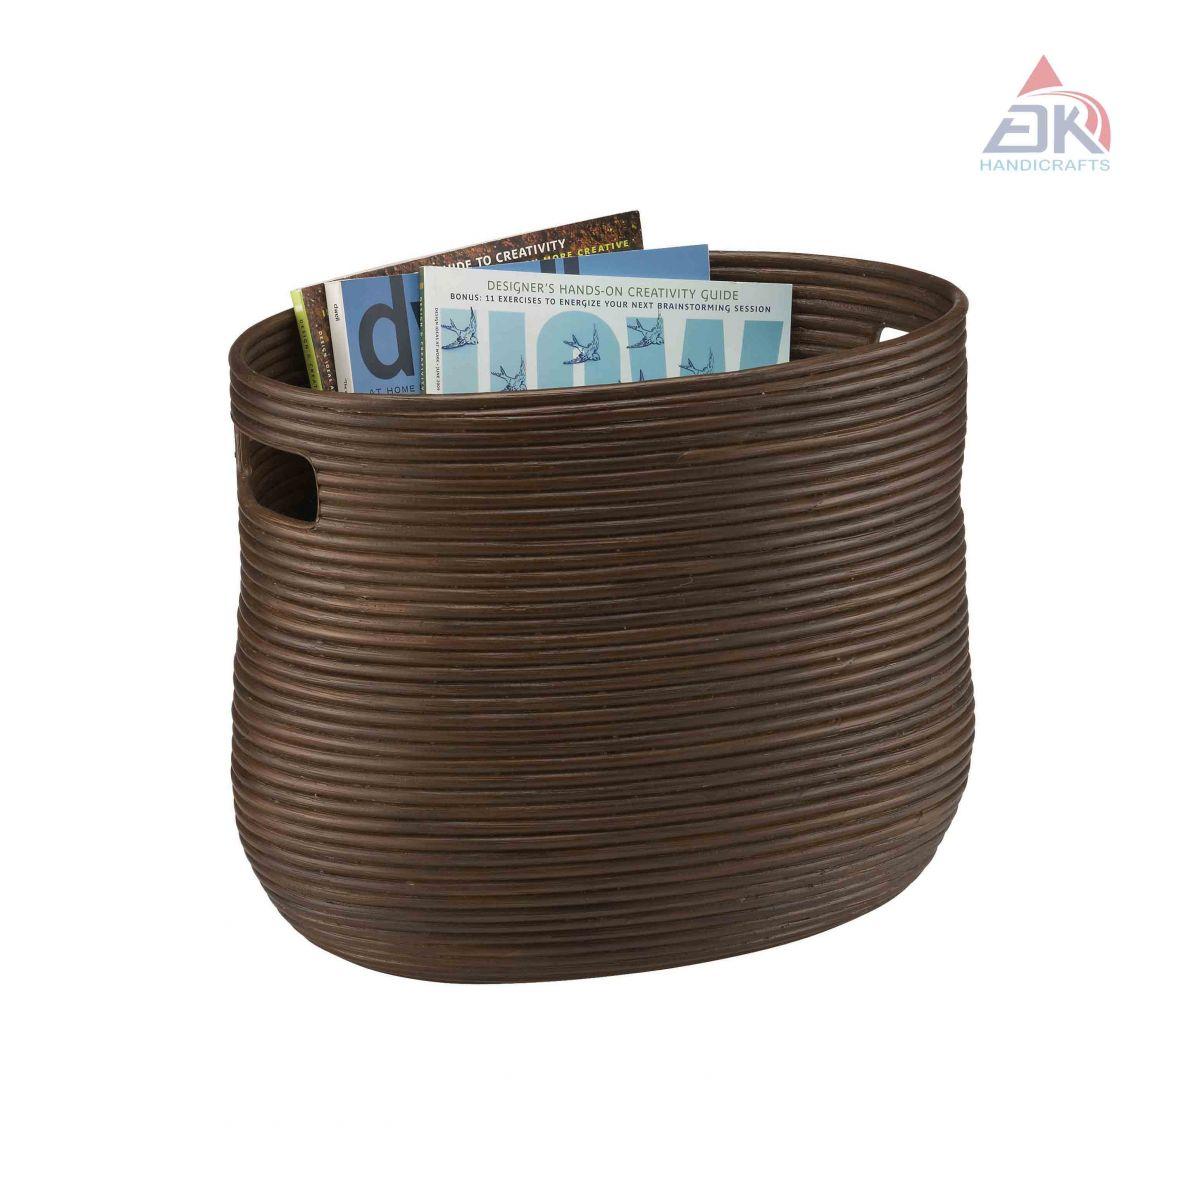 Coiled Magazine Basket # DK34